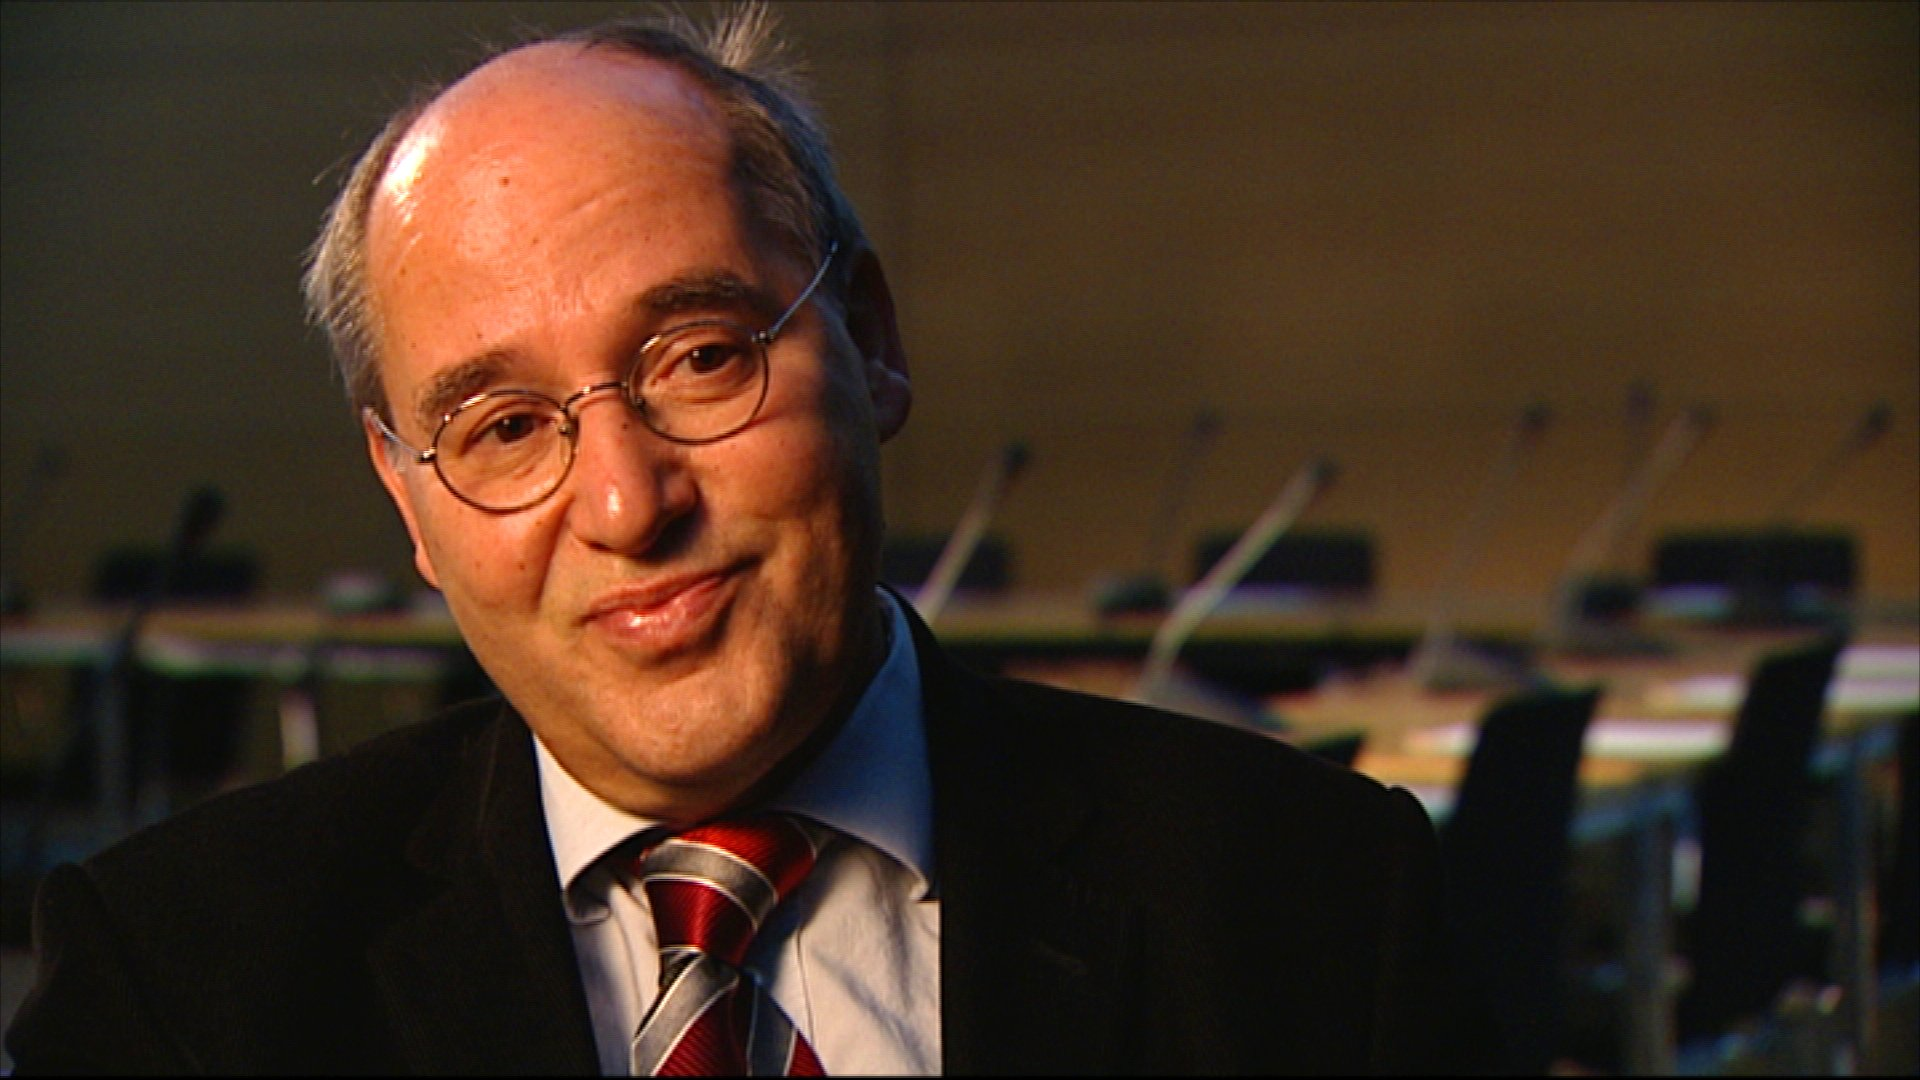 Gregor Gysi, 2007.